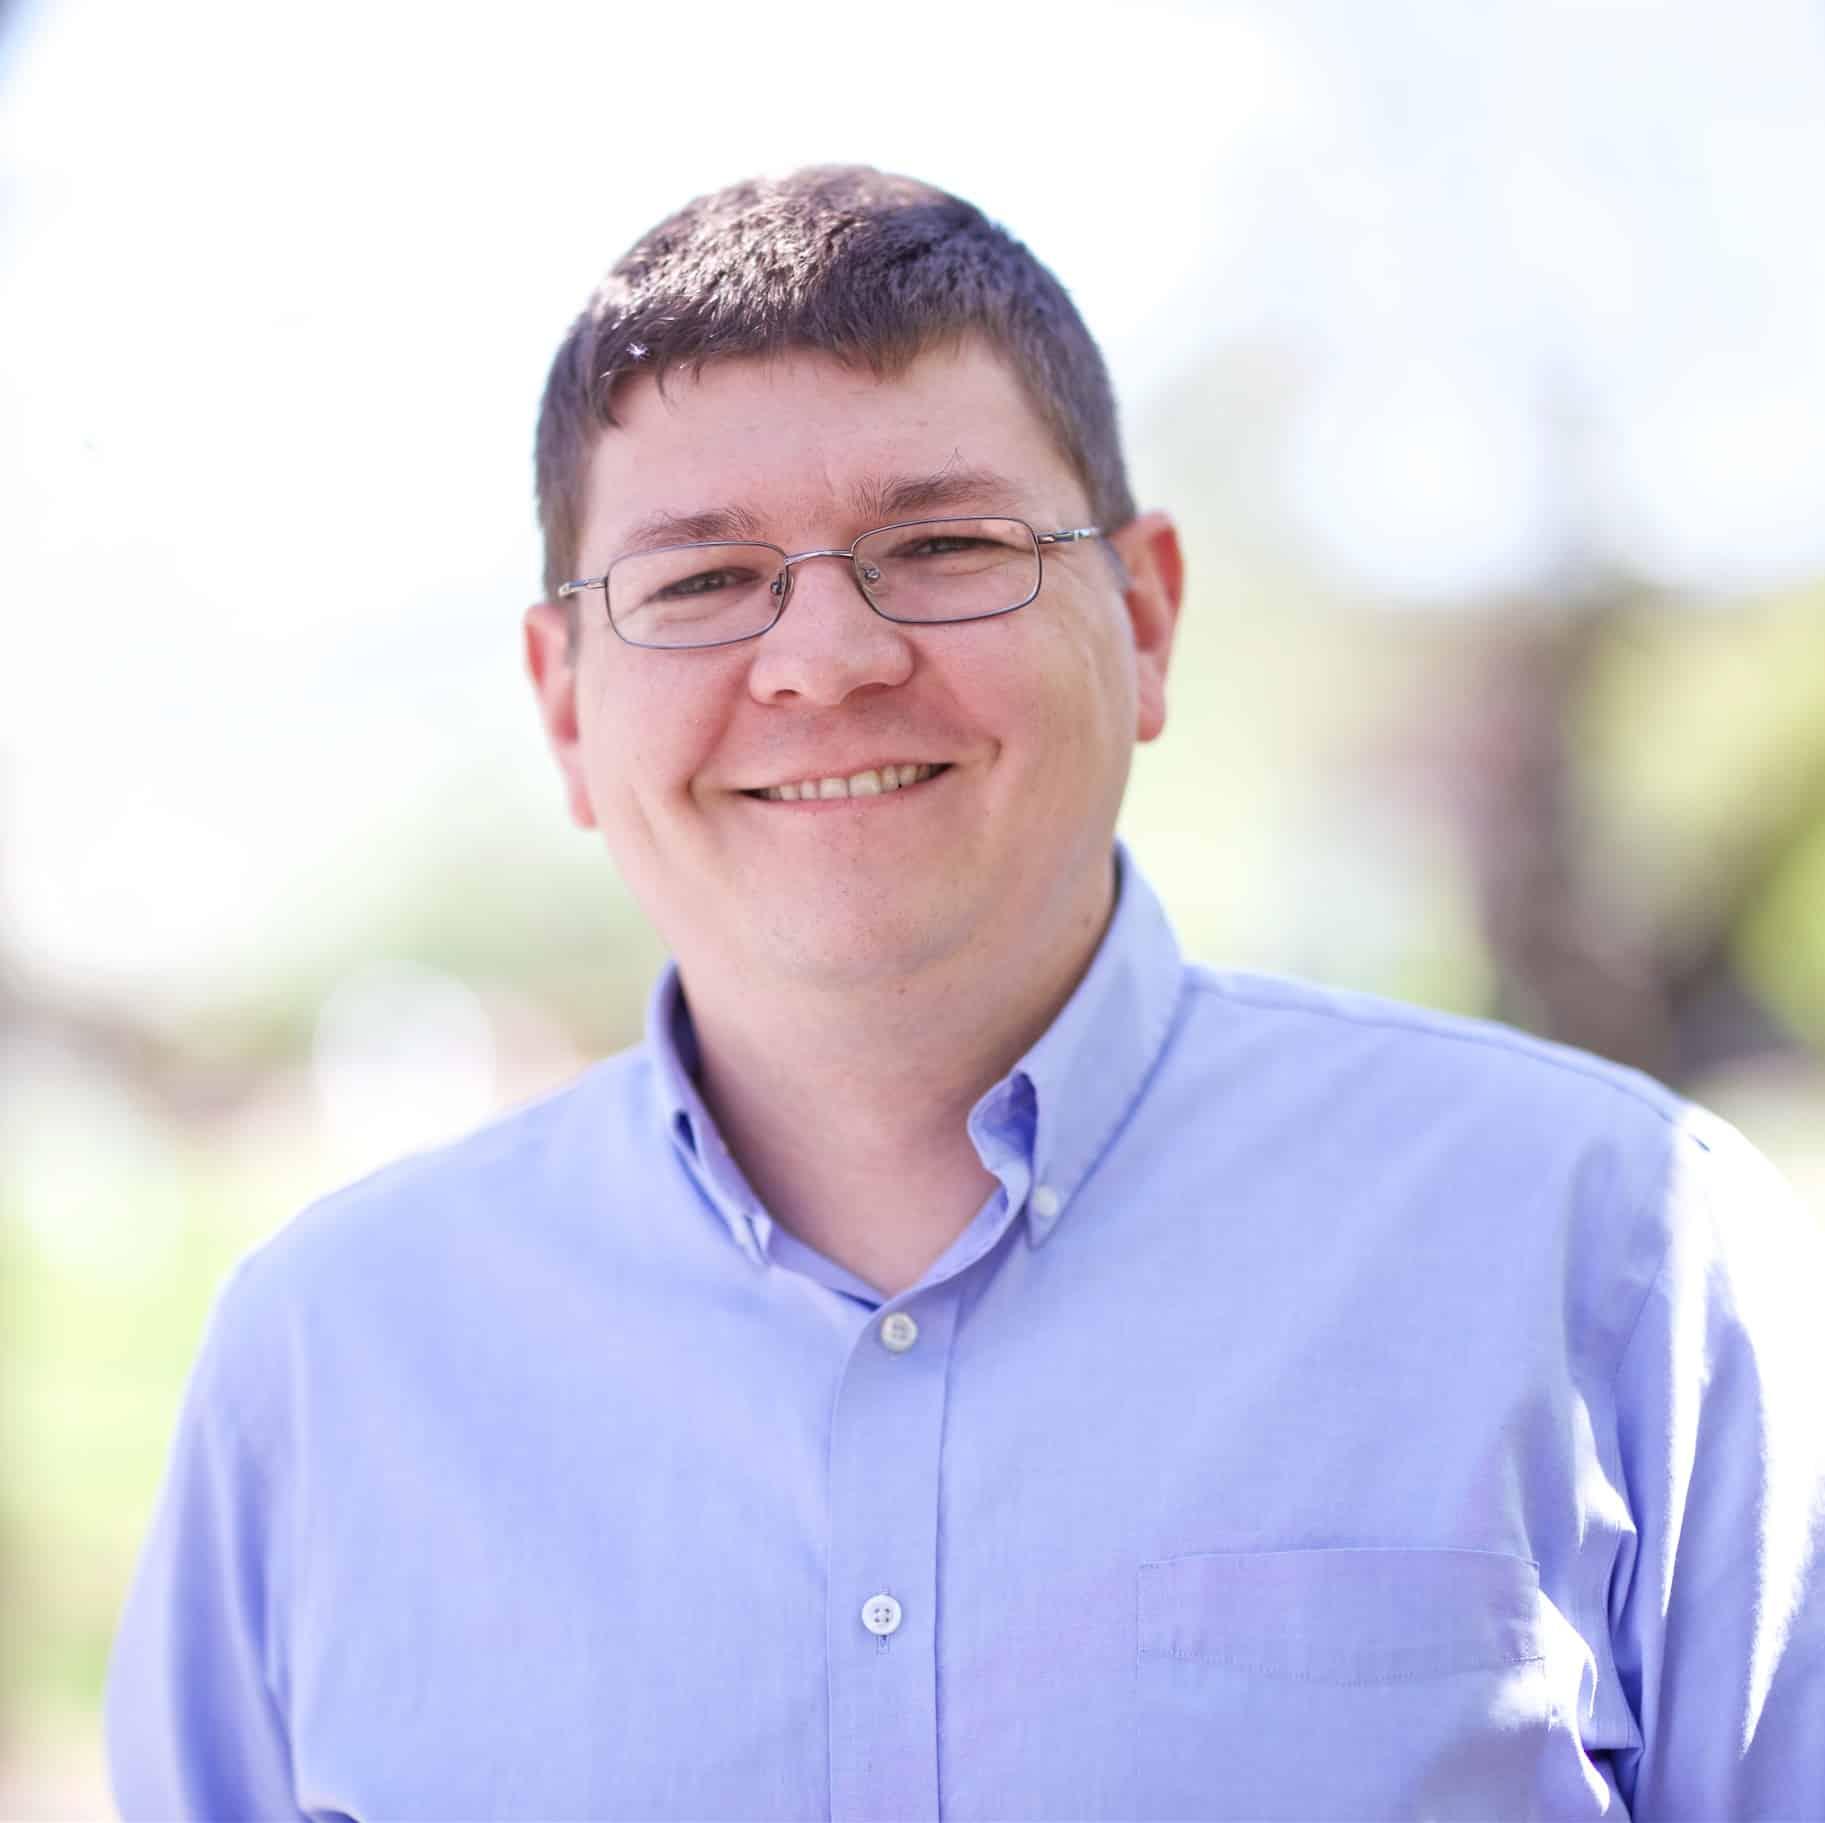 A photo of Professor Jeremy Ouellette, smiling